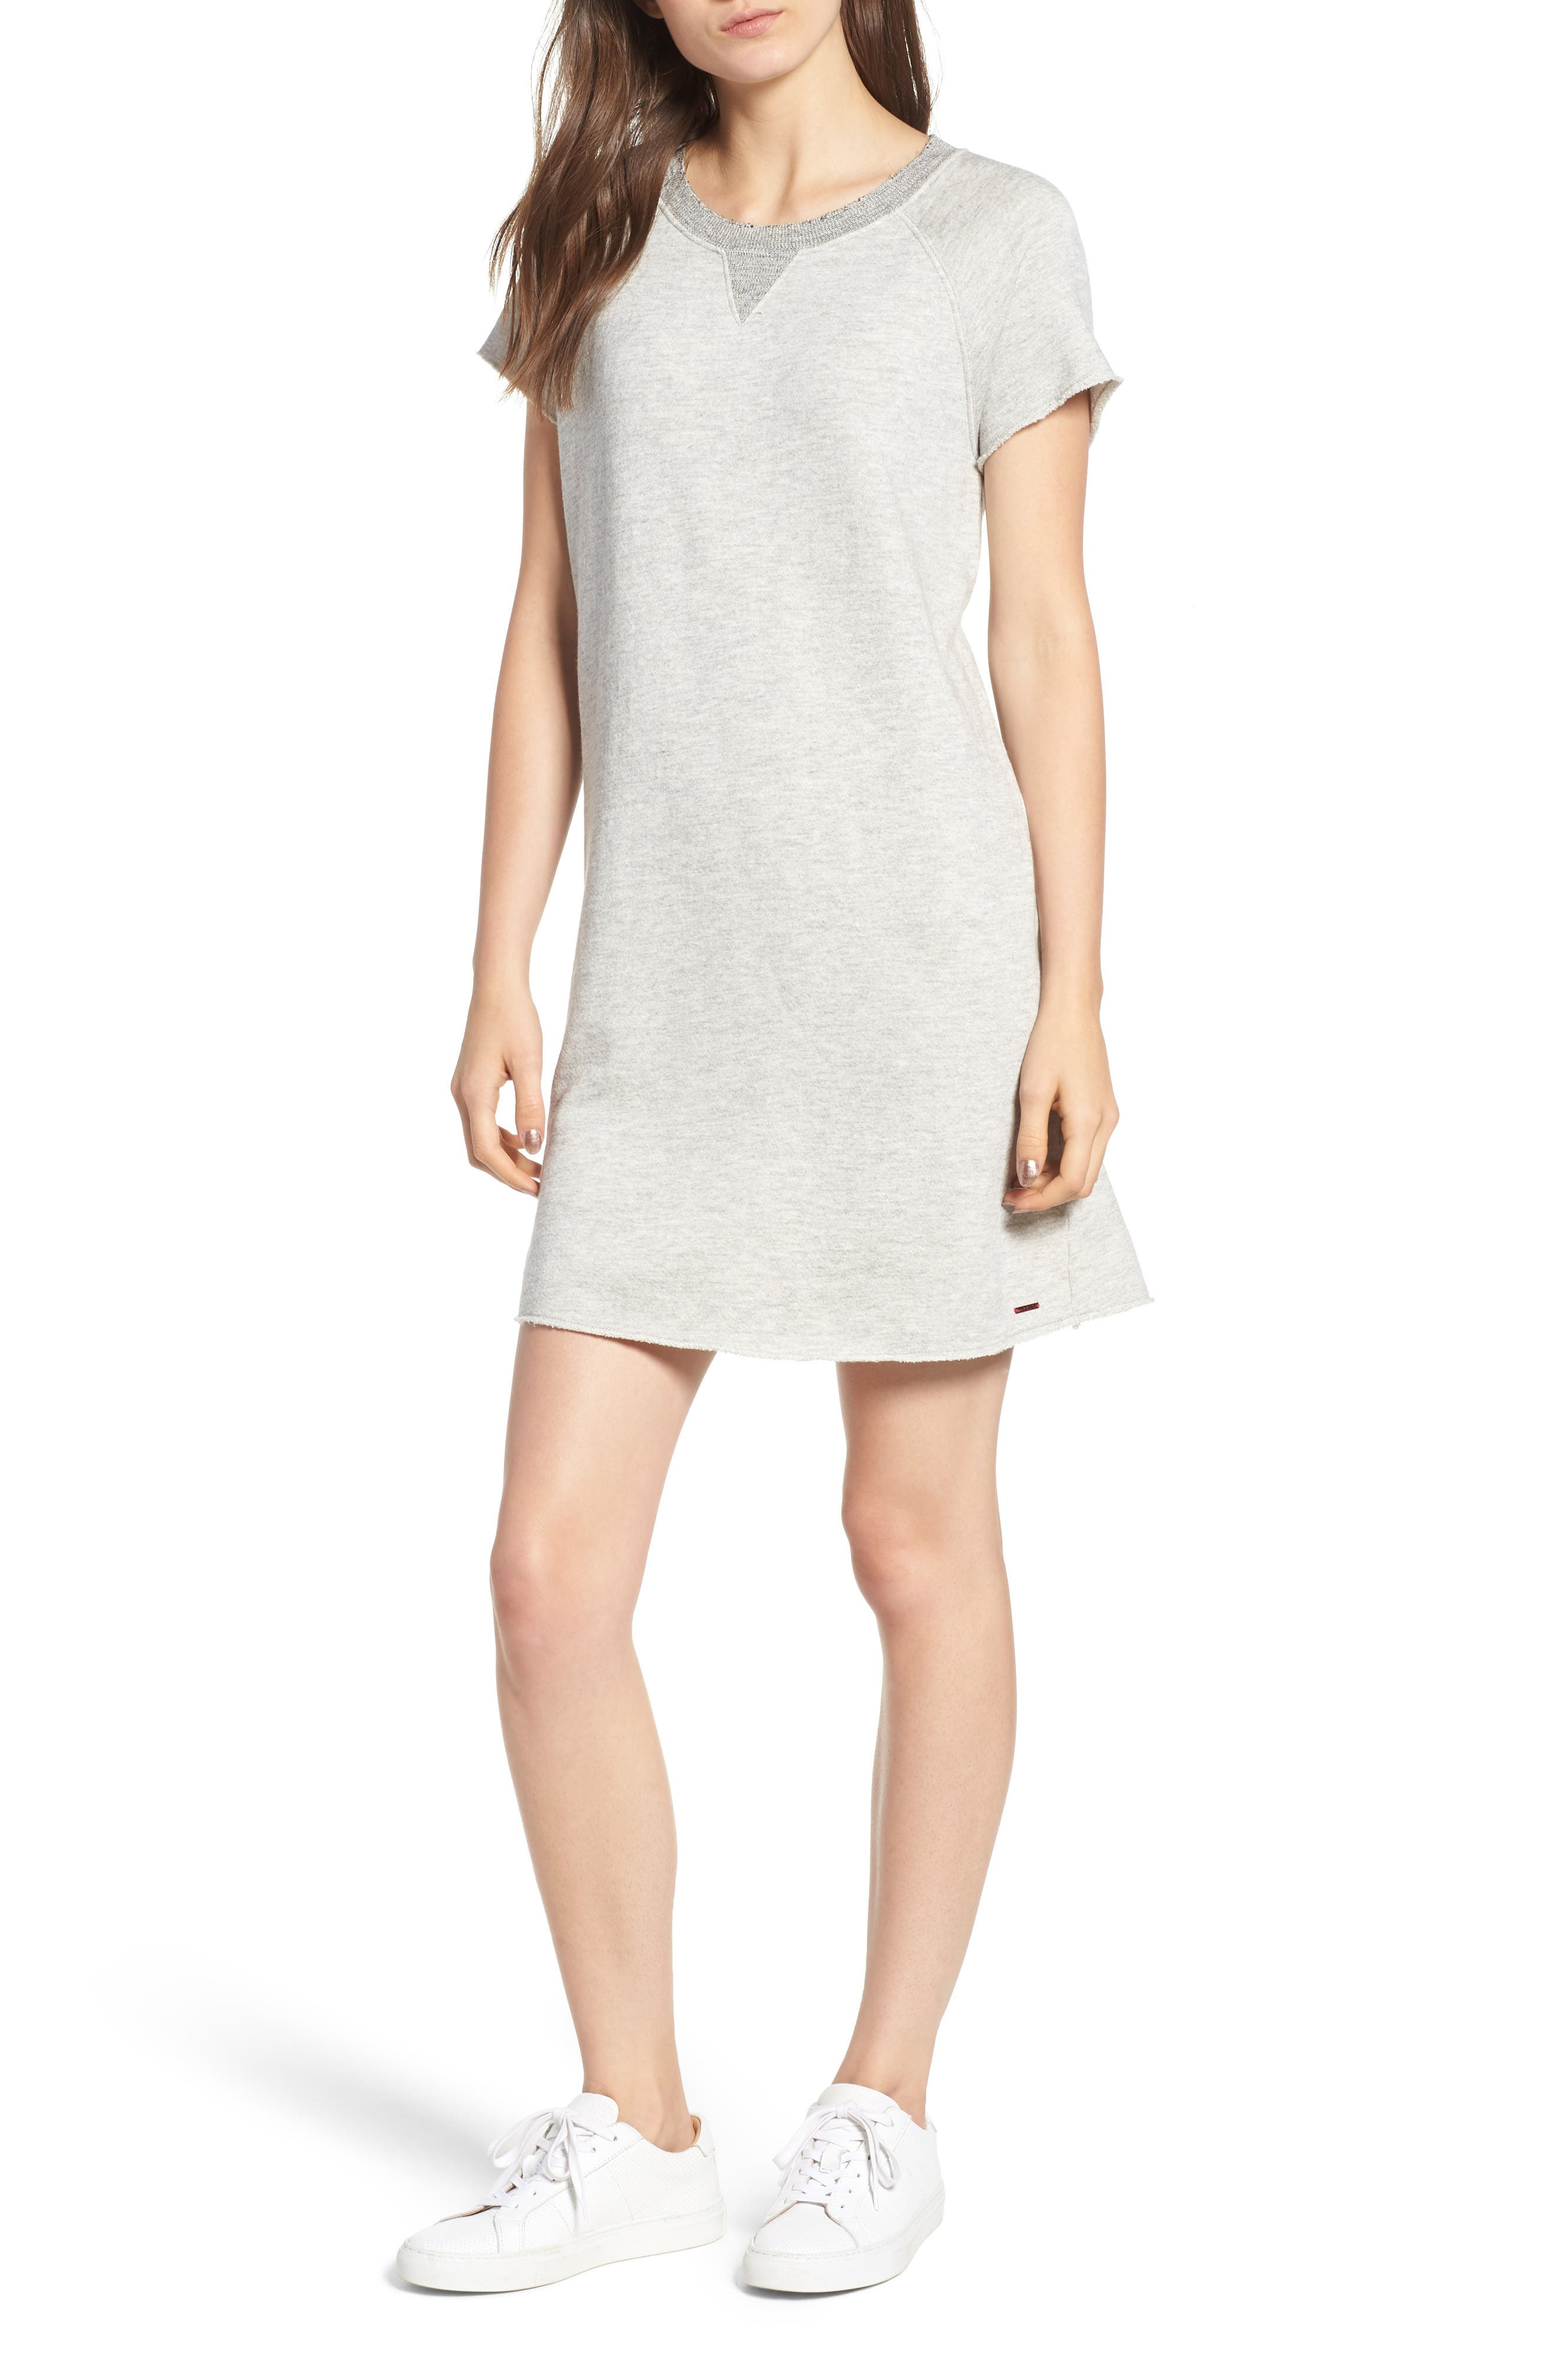 CALALILY SWEATSHIRT DRESS